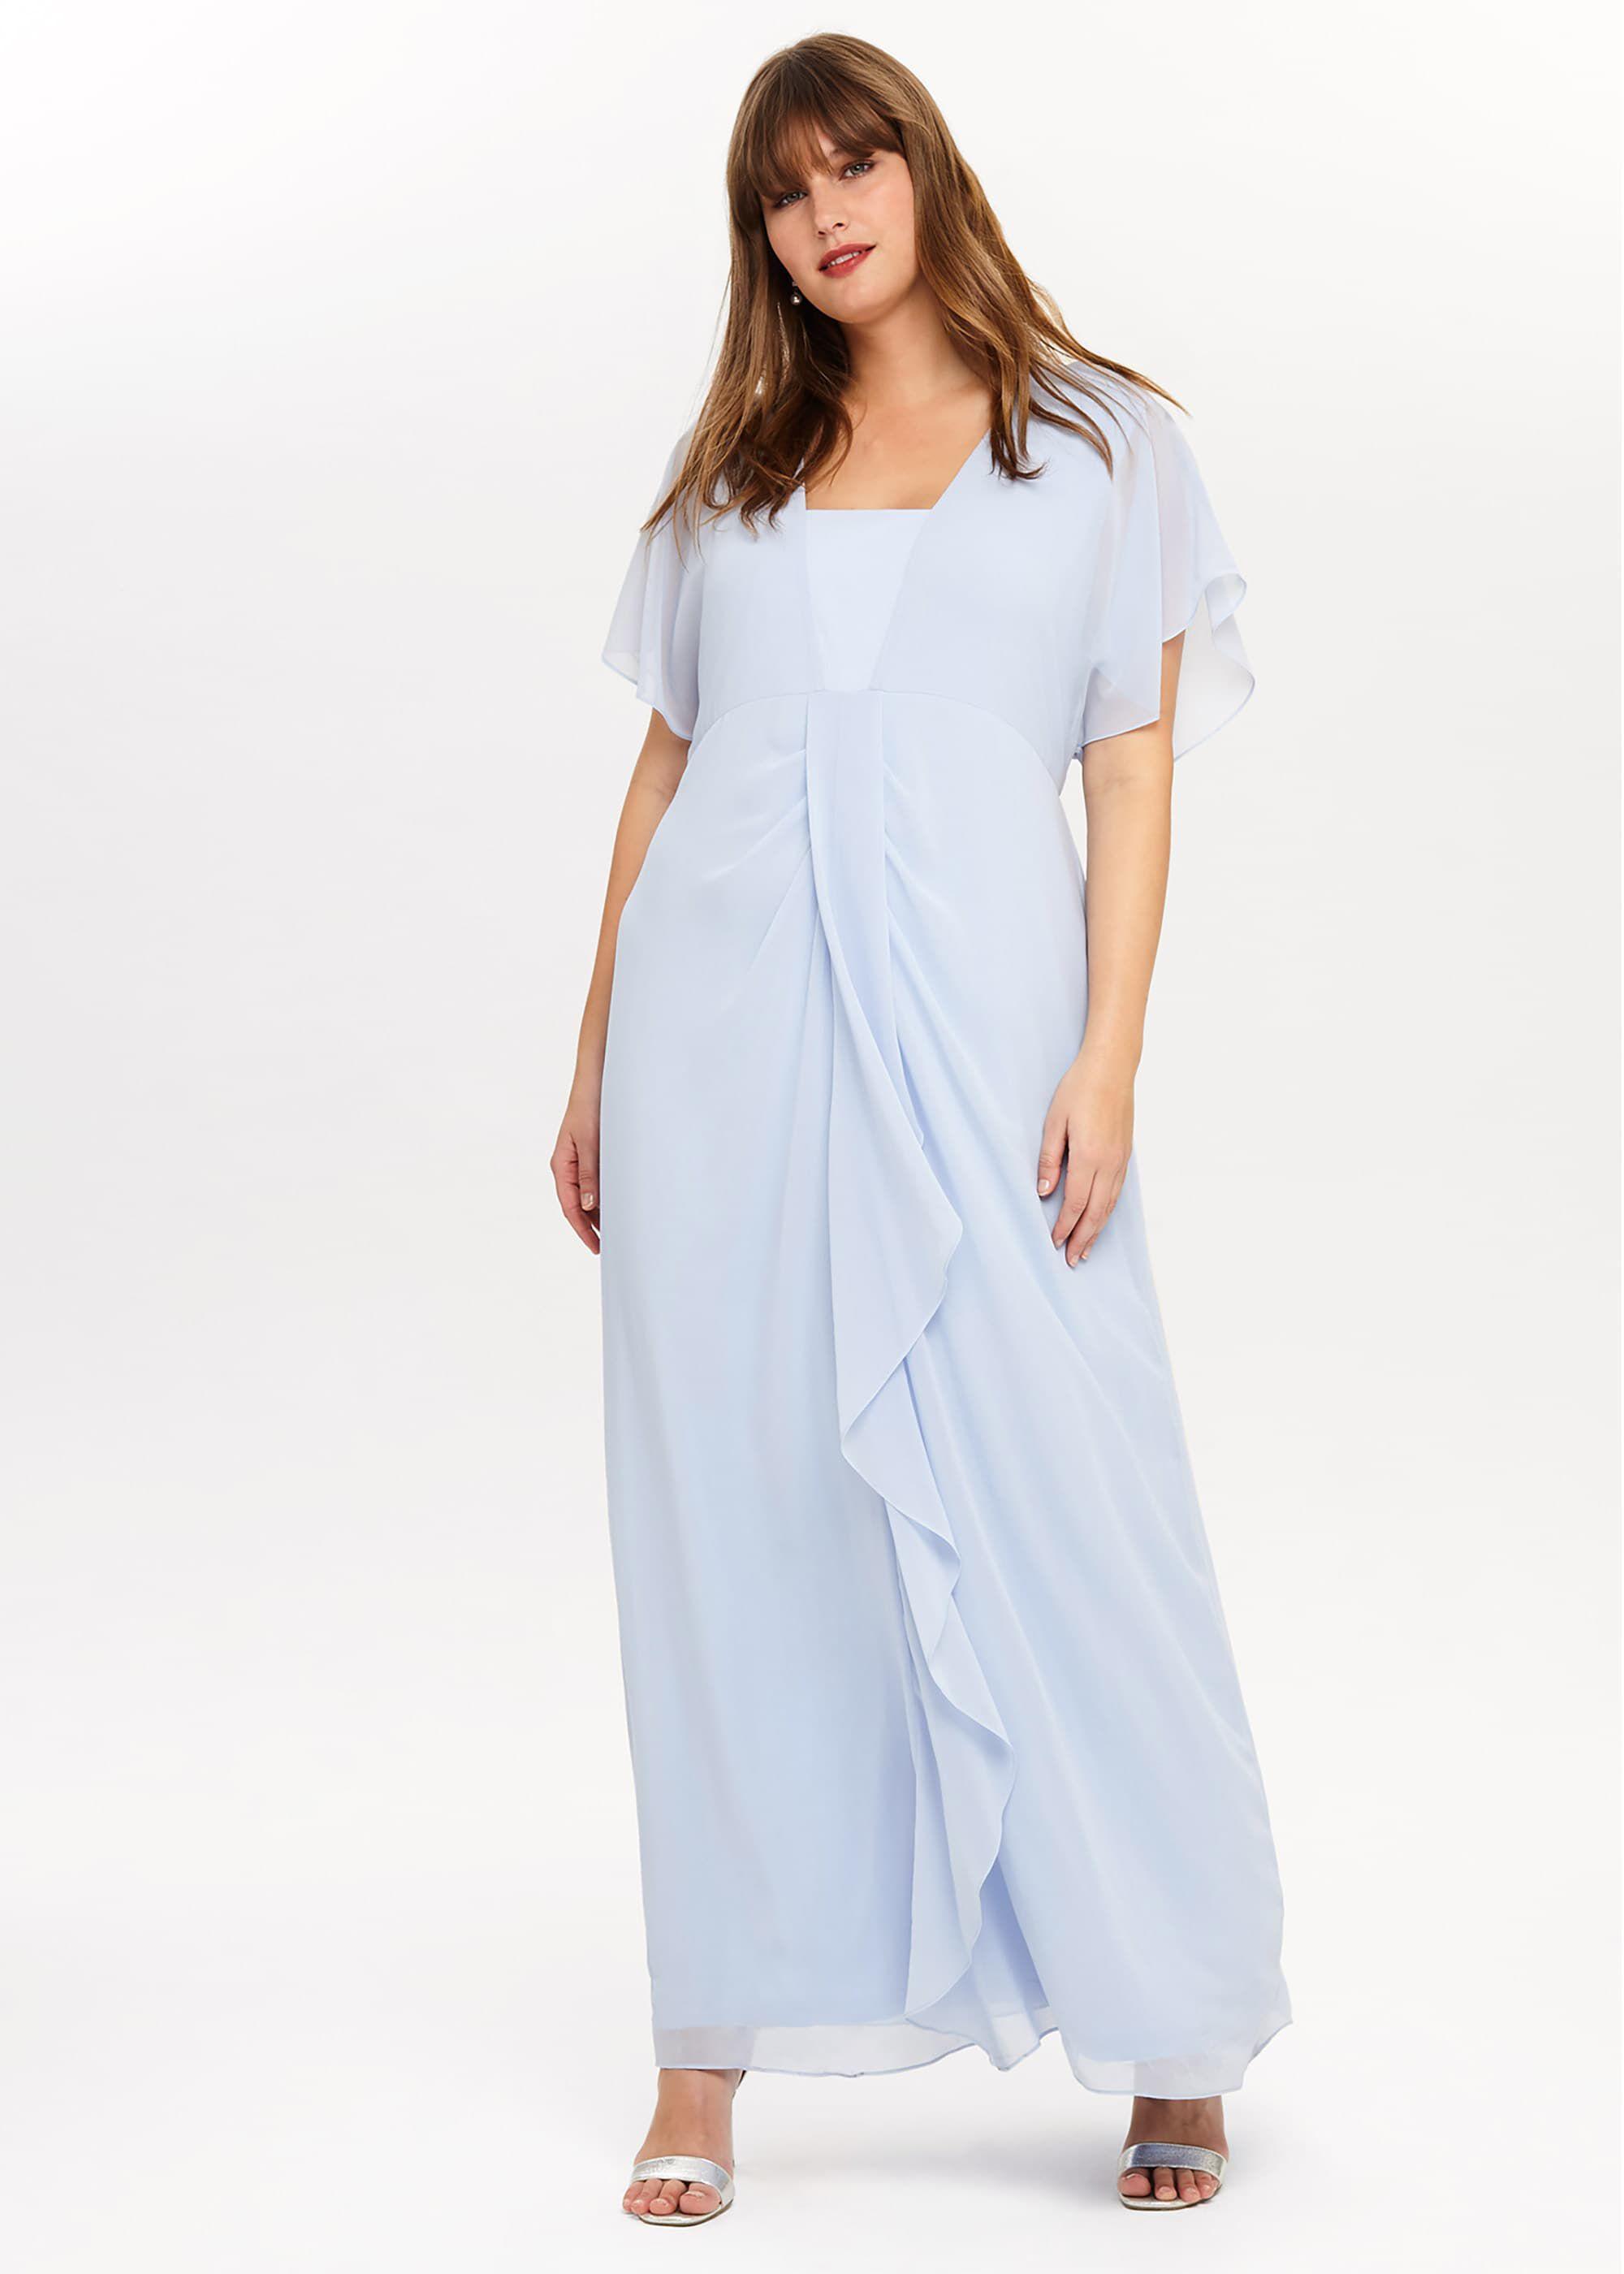 Plus Size Bridesmaid Dresses | Studio 8 by